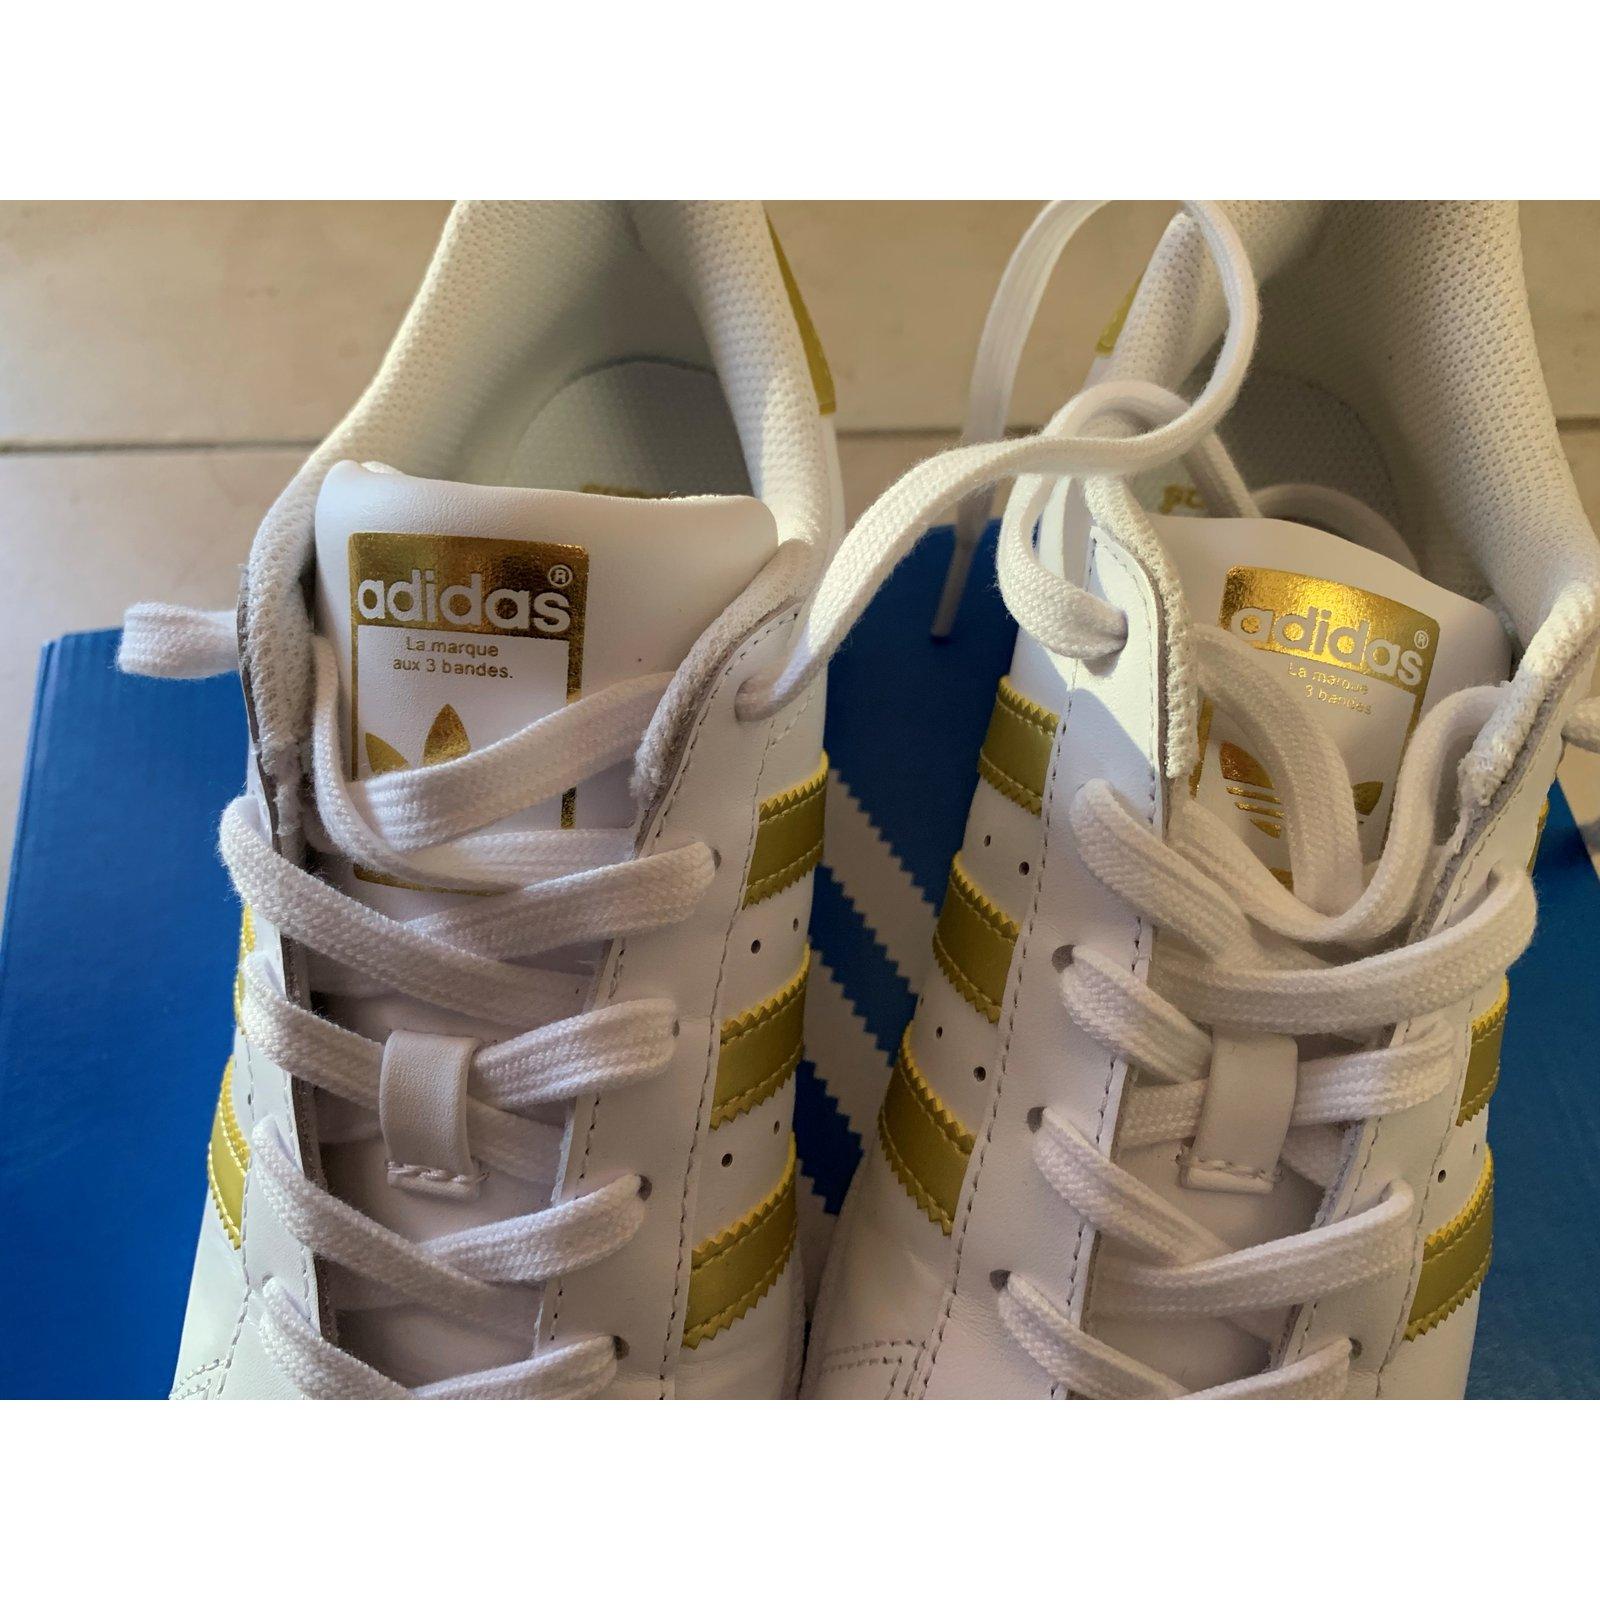 Adidas Superstar Basketball New Gold Color Band